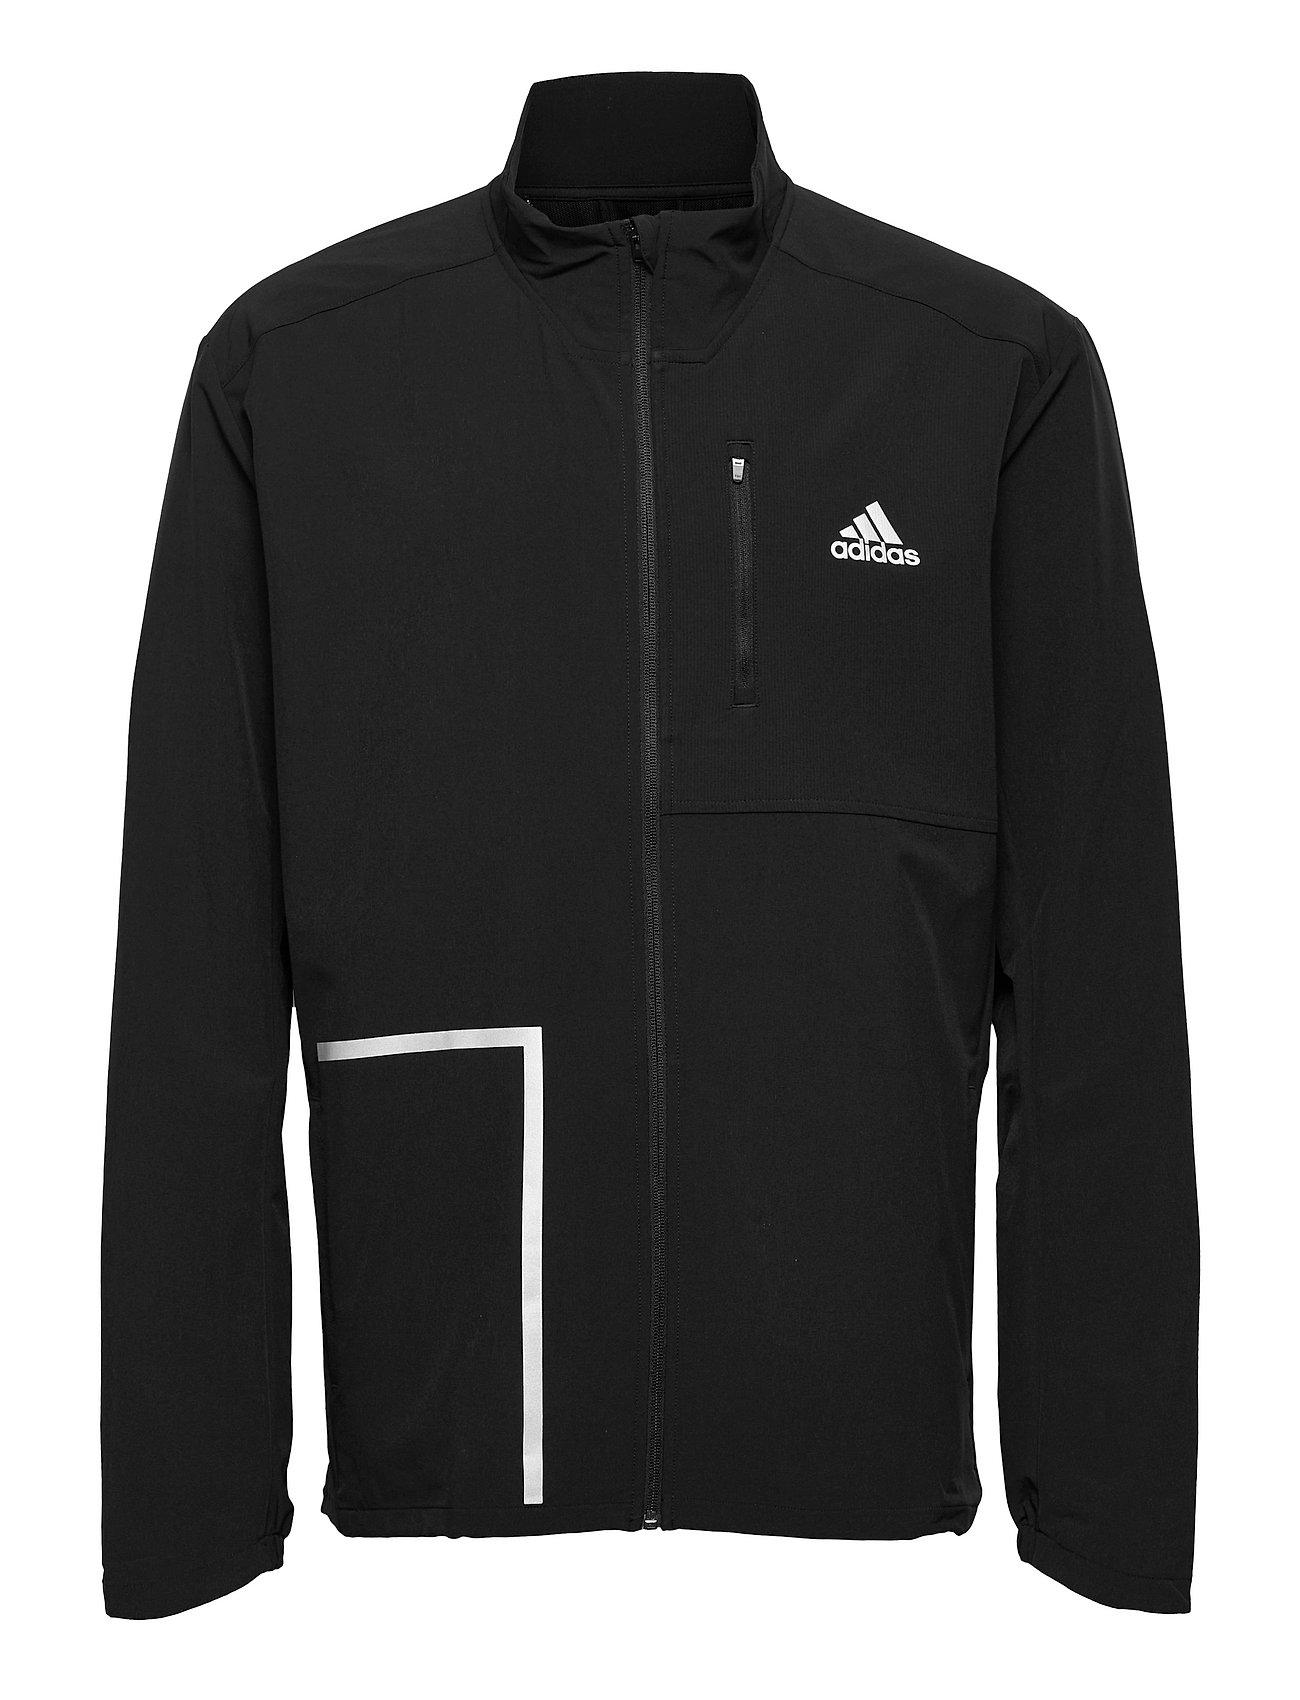 Own The Run Soft Shell Jacket Outerwear Sport Jackets Sort Adidas Performance